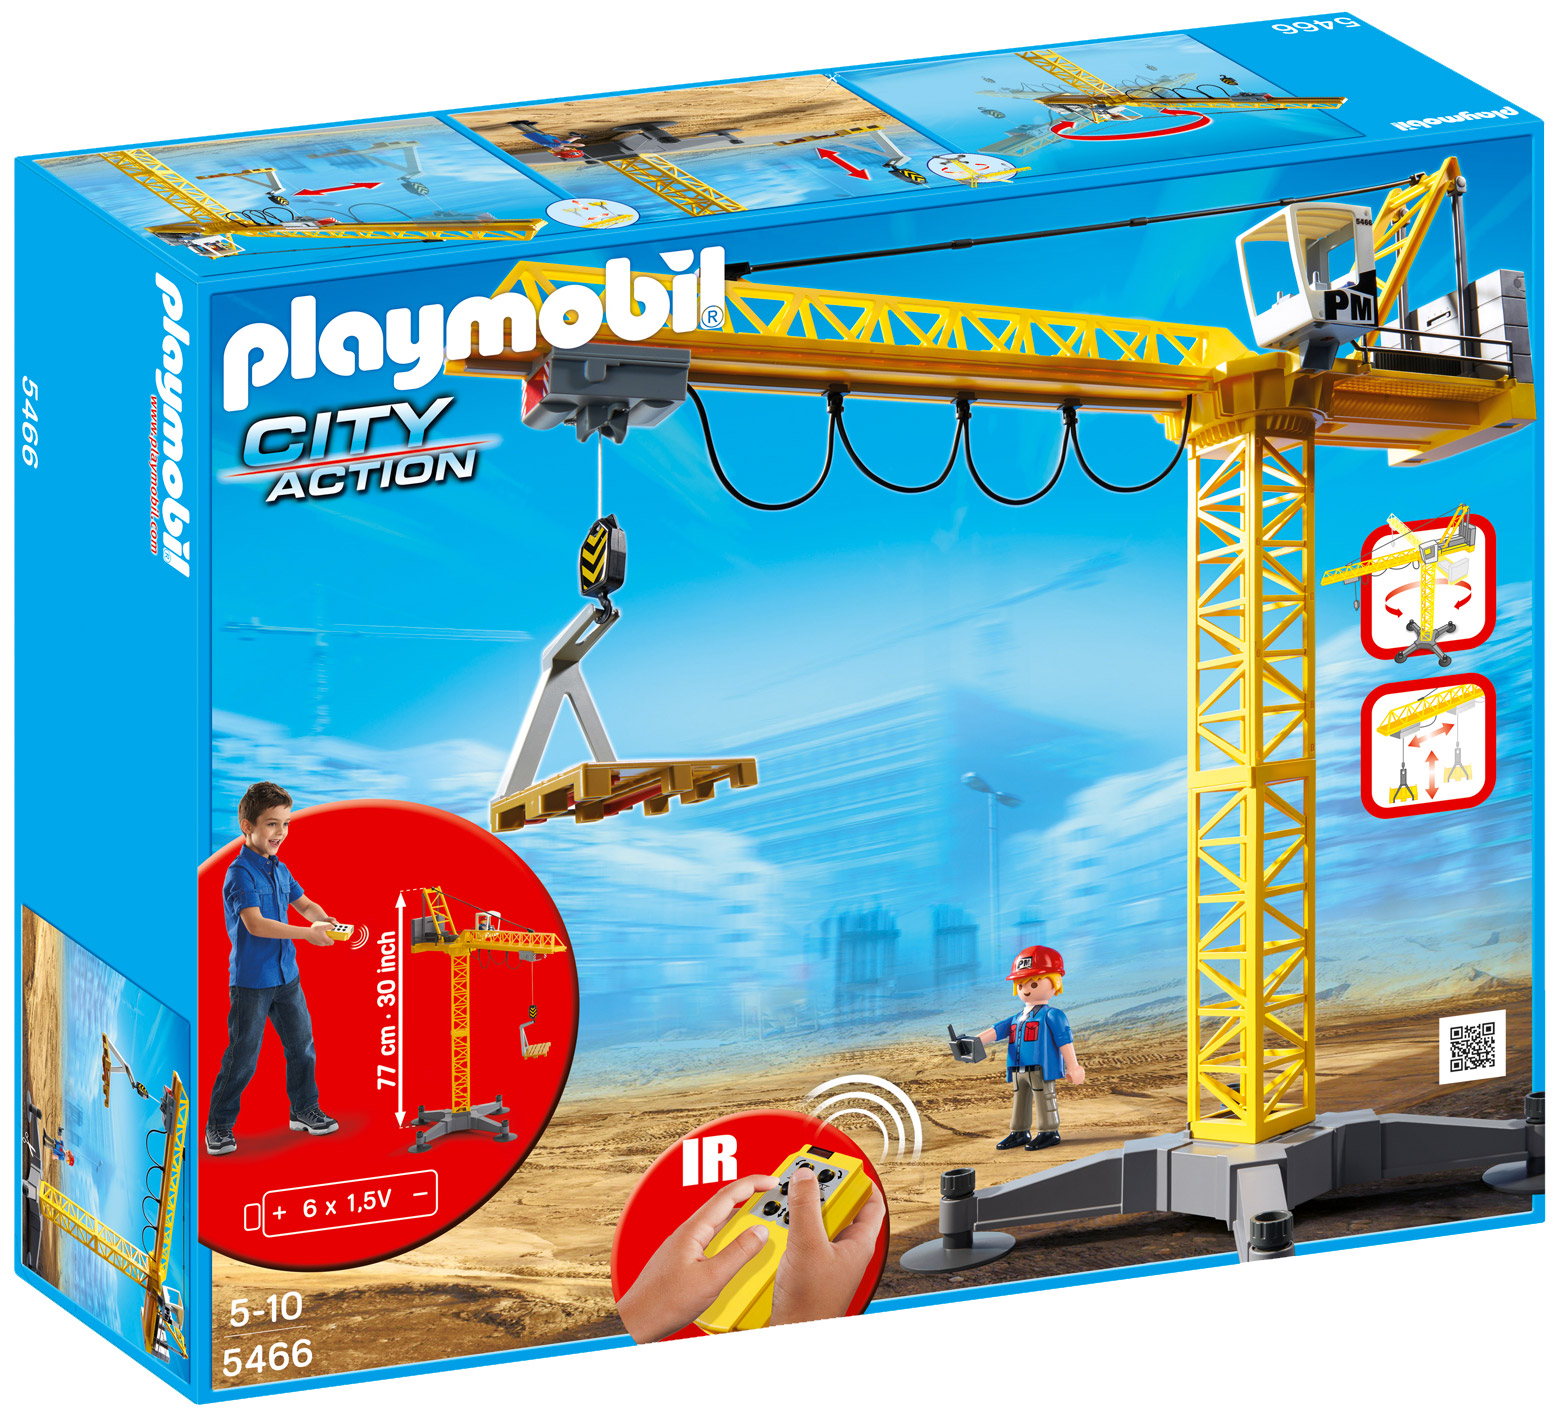 playmobil city action 5466 pas cher grande grue de. Black Bedroom Furniture Sets. Home Design Ideas